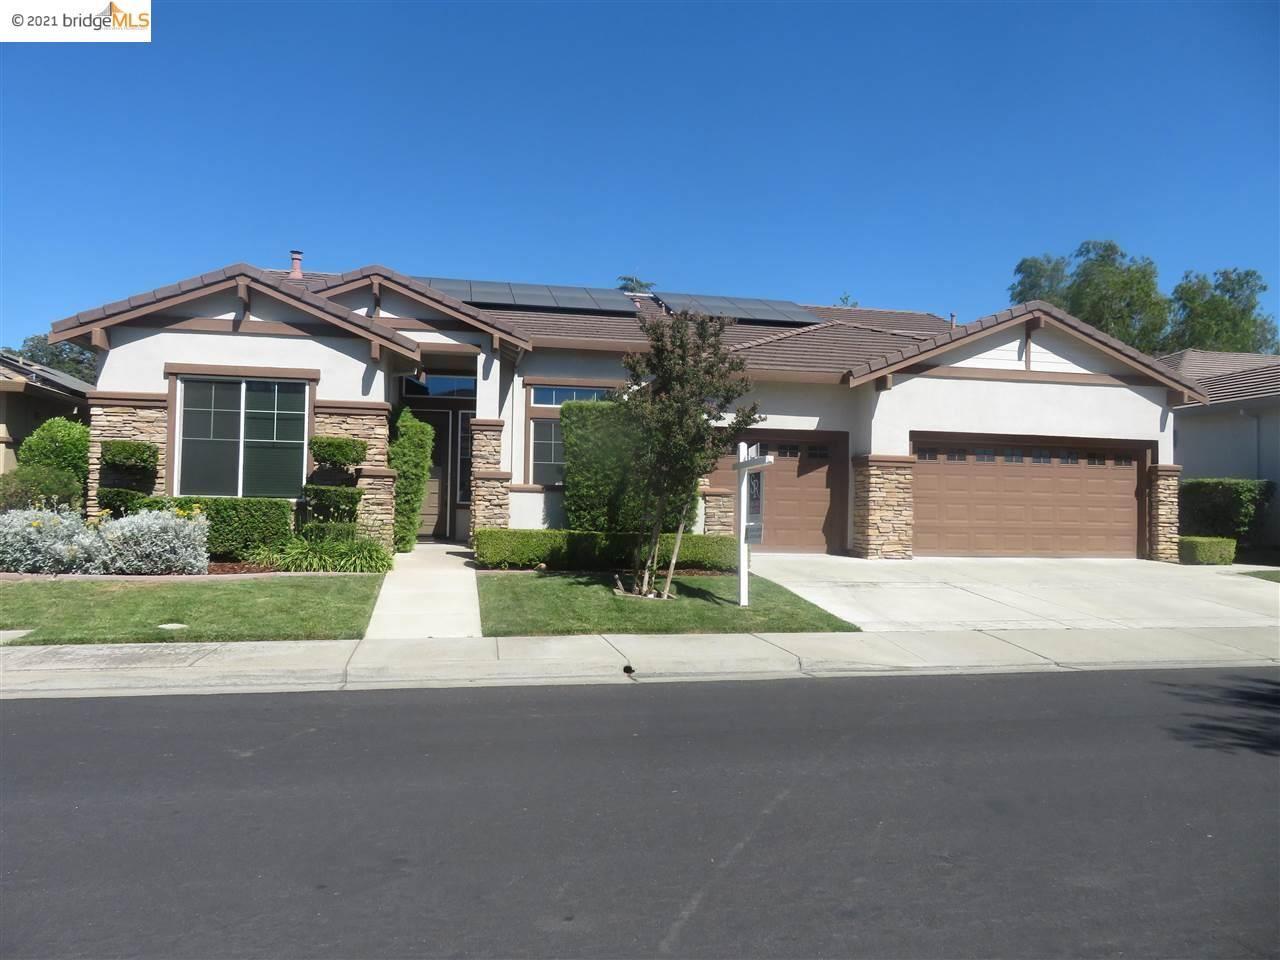 Photo of 776 CENTENNIAL PL, BRENTWOOD, CA 94513 (MLS # 40961130)